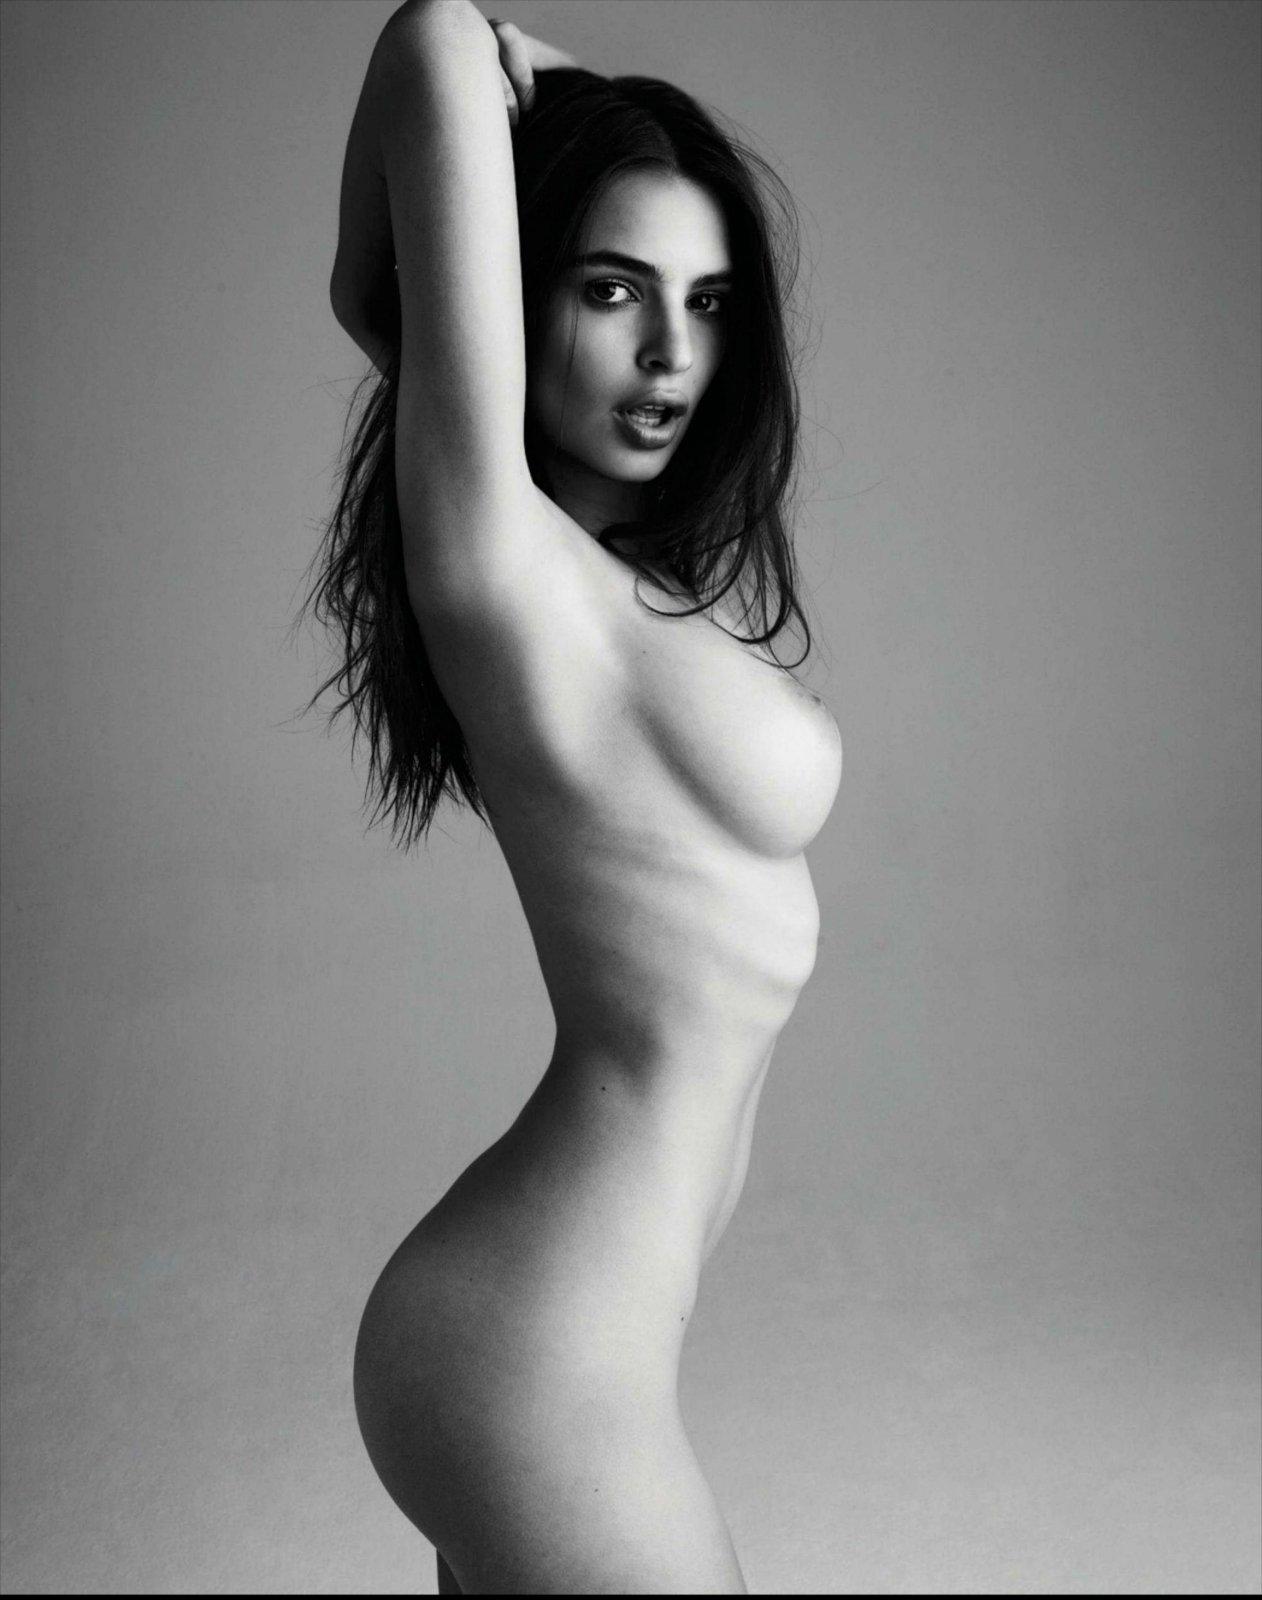 Nude Pics Of Emily Ratajk...